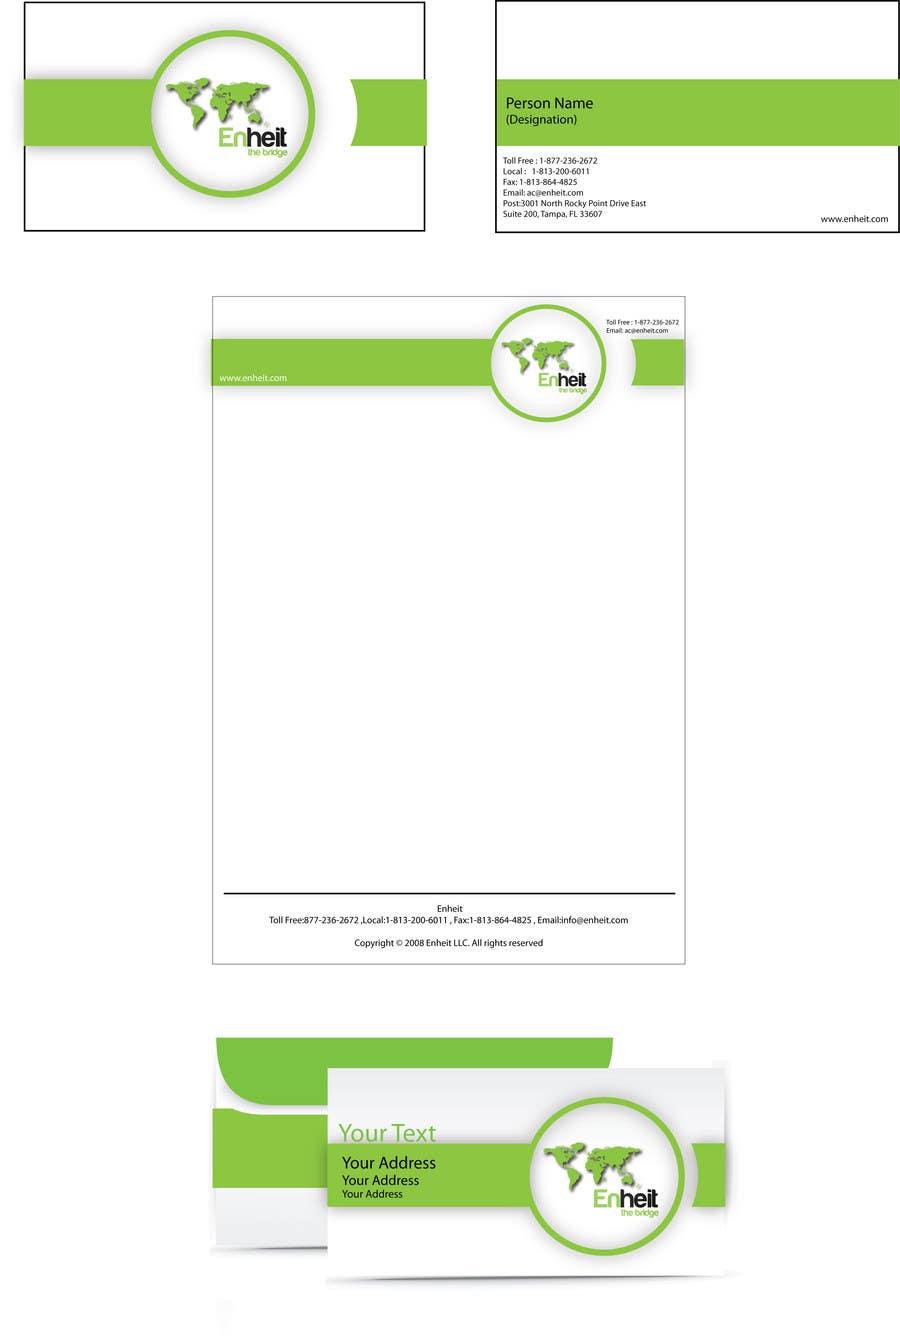 Penyertaan Peraduan #                                        12                                      untuk                                         Letterhead, business card and envelop package design for Enheit